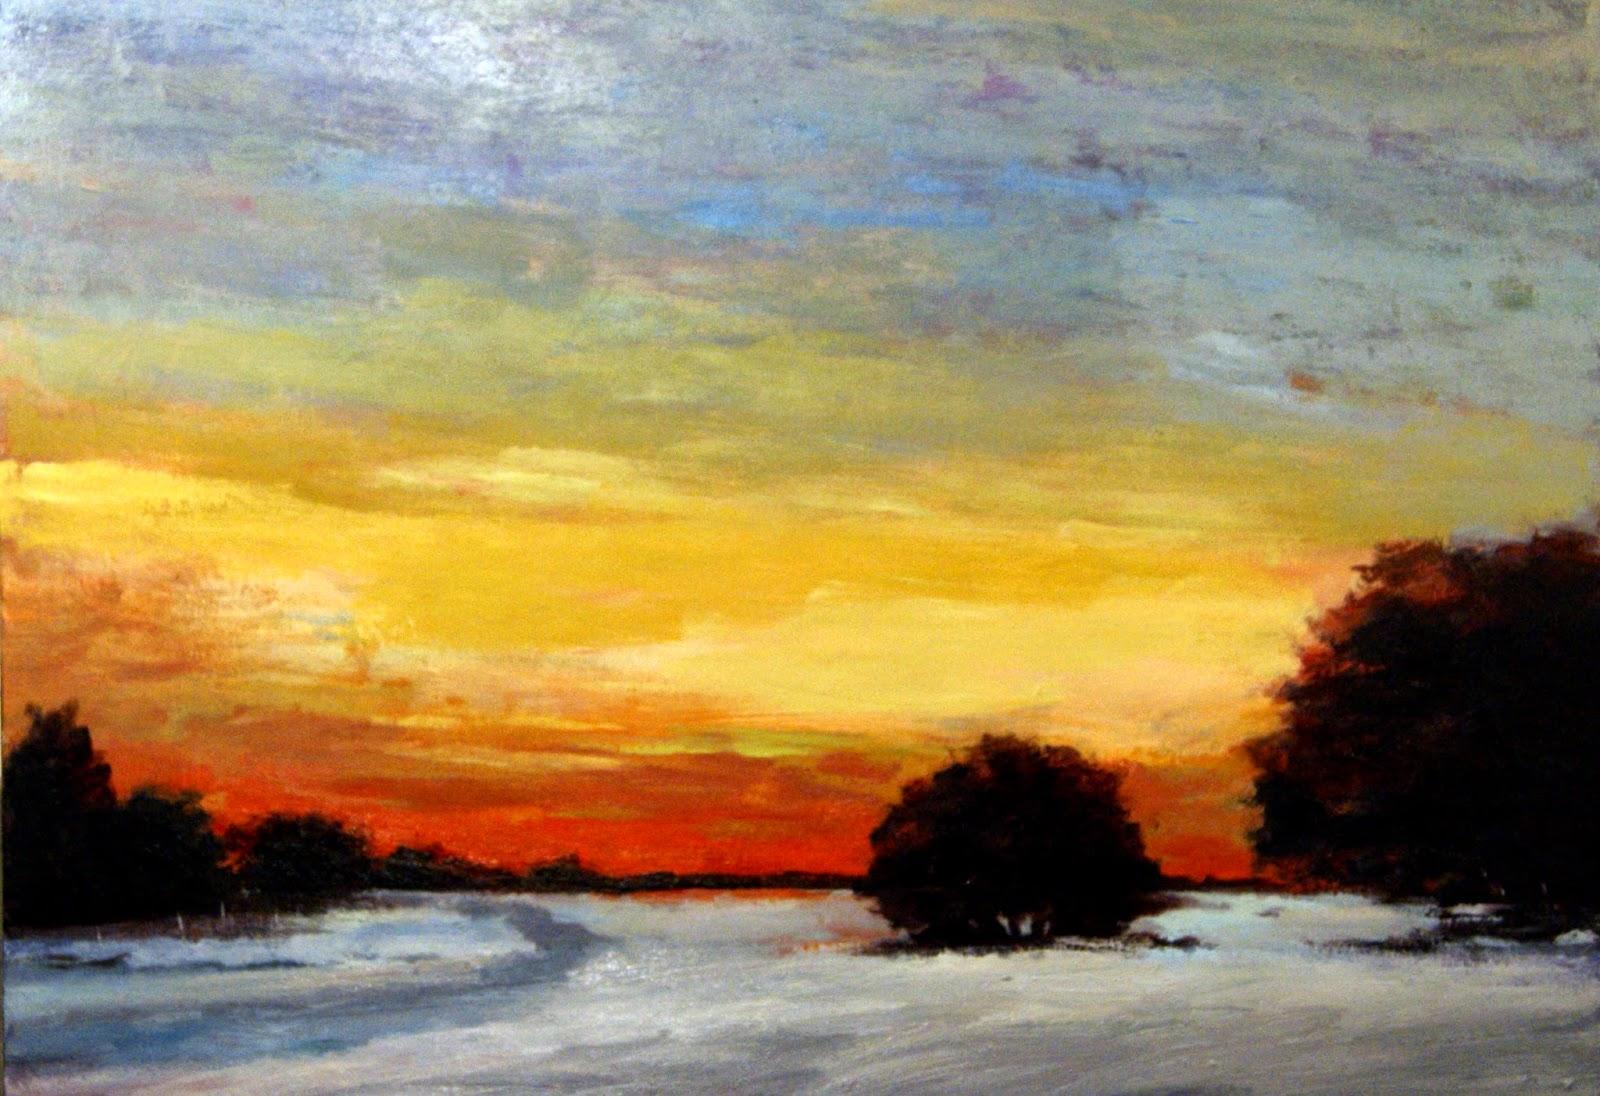 Abbas Darabi - Sunlight and Snow